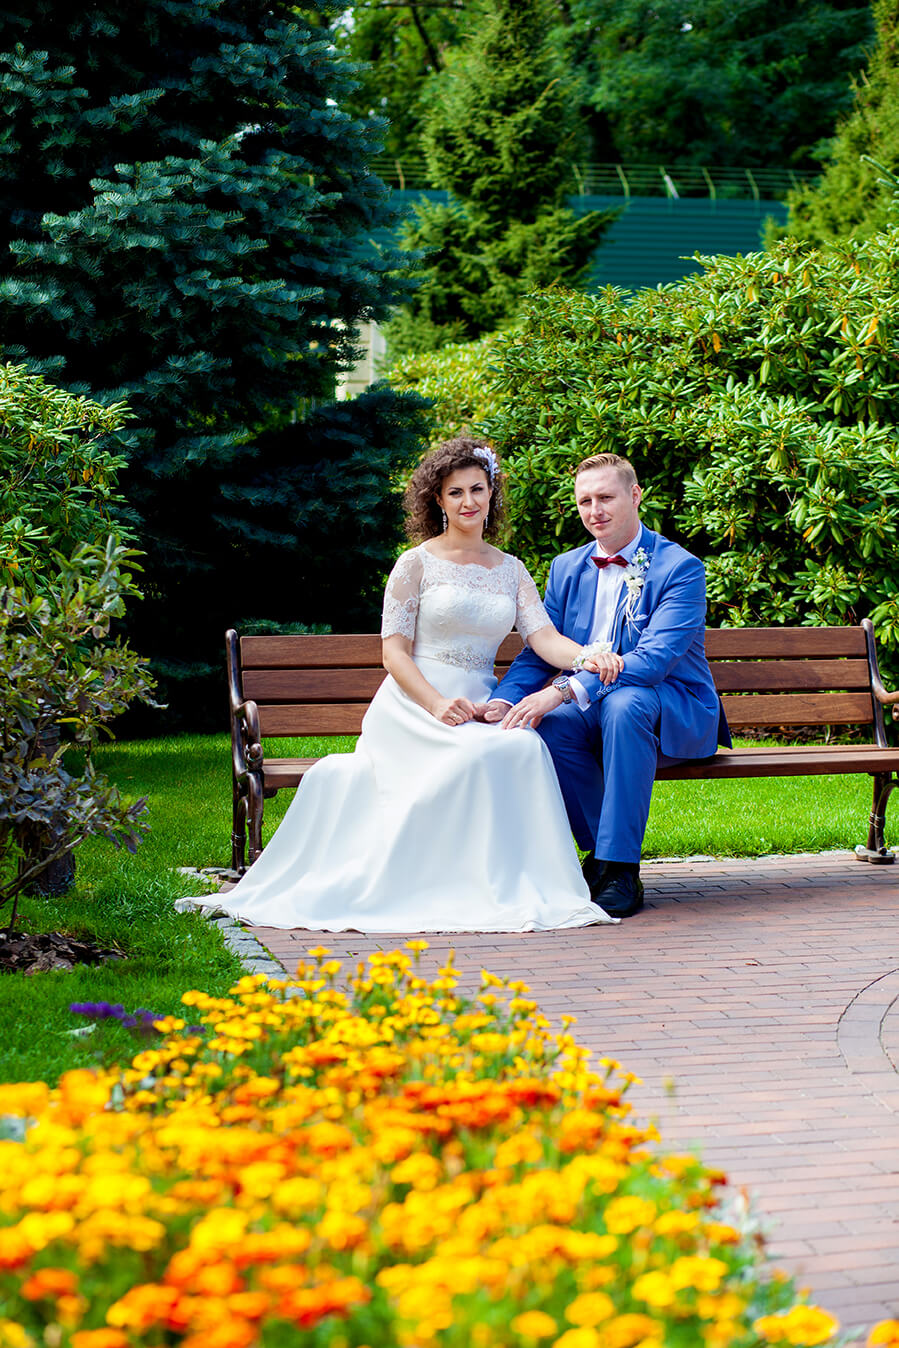 3-svadebnyj-fotograf-videooperator-svadebnoe-foto-idei-kiev-17